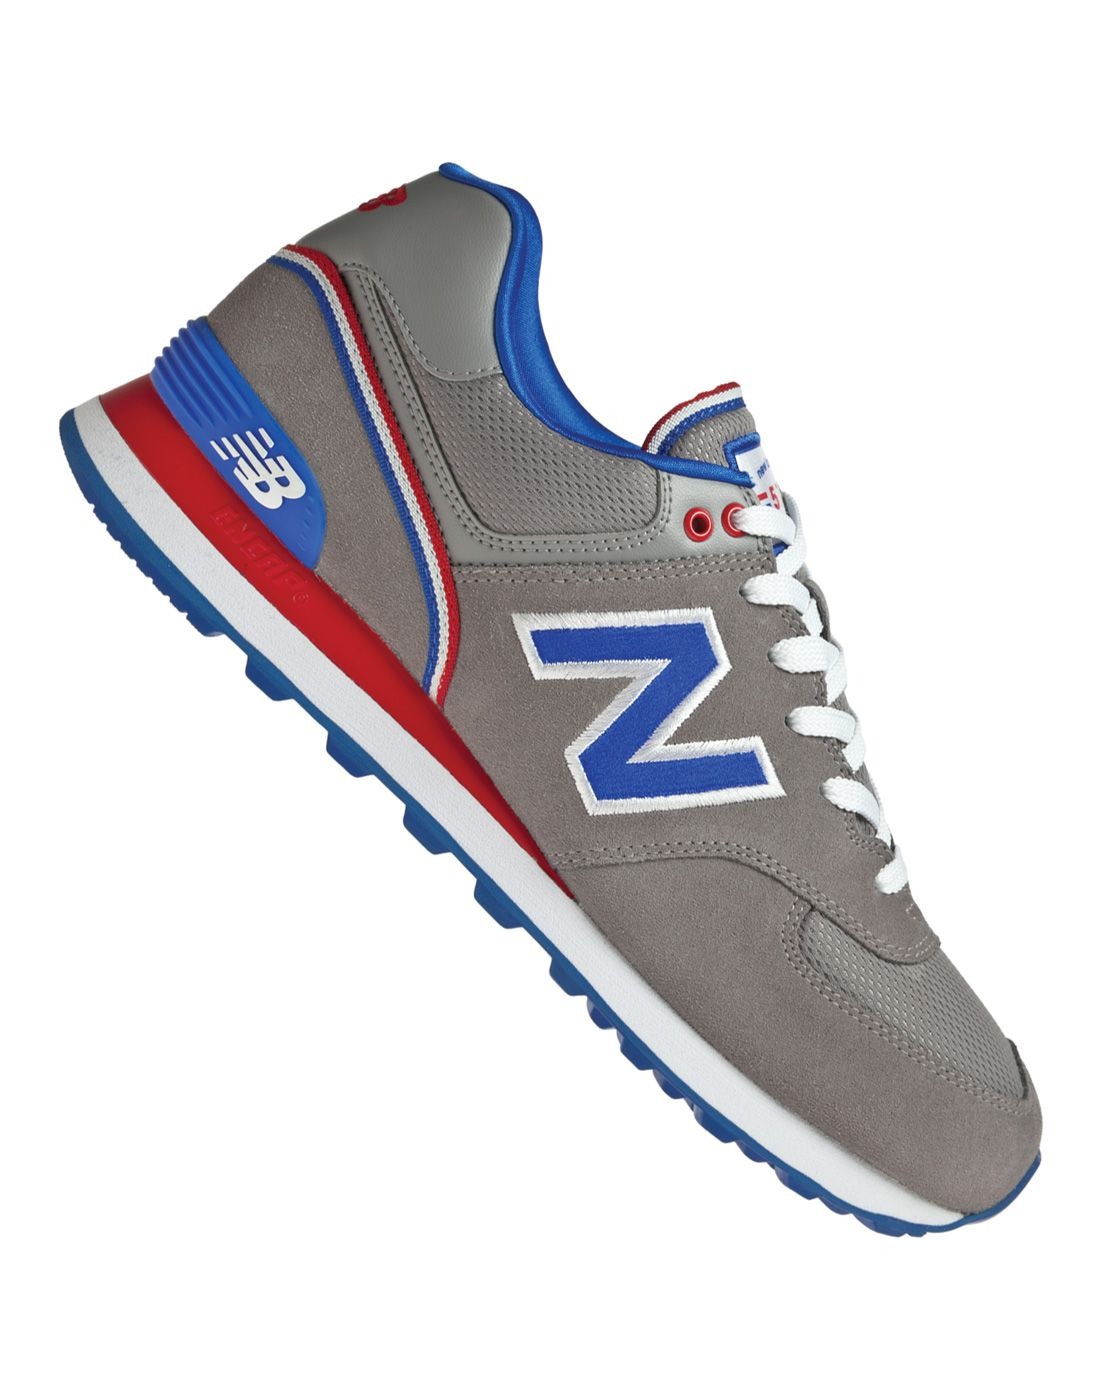 Mens 574 Trainer Trainers, Men, Sneakers